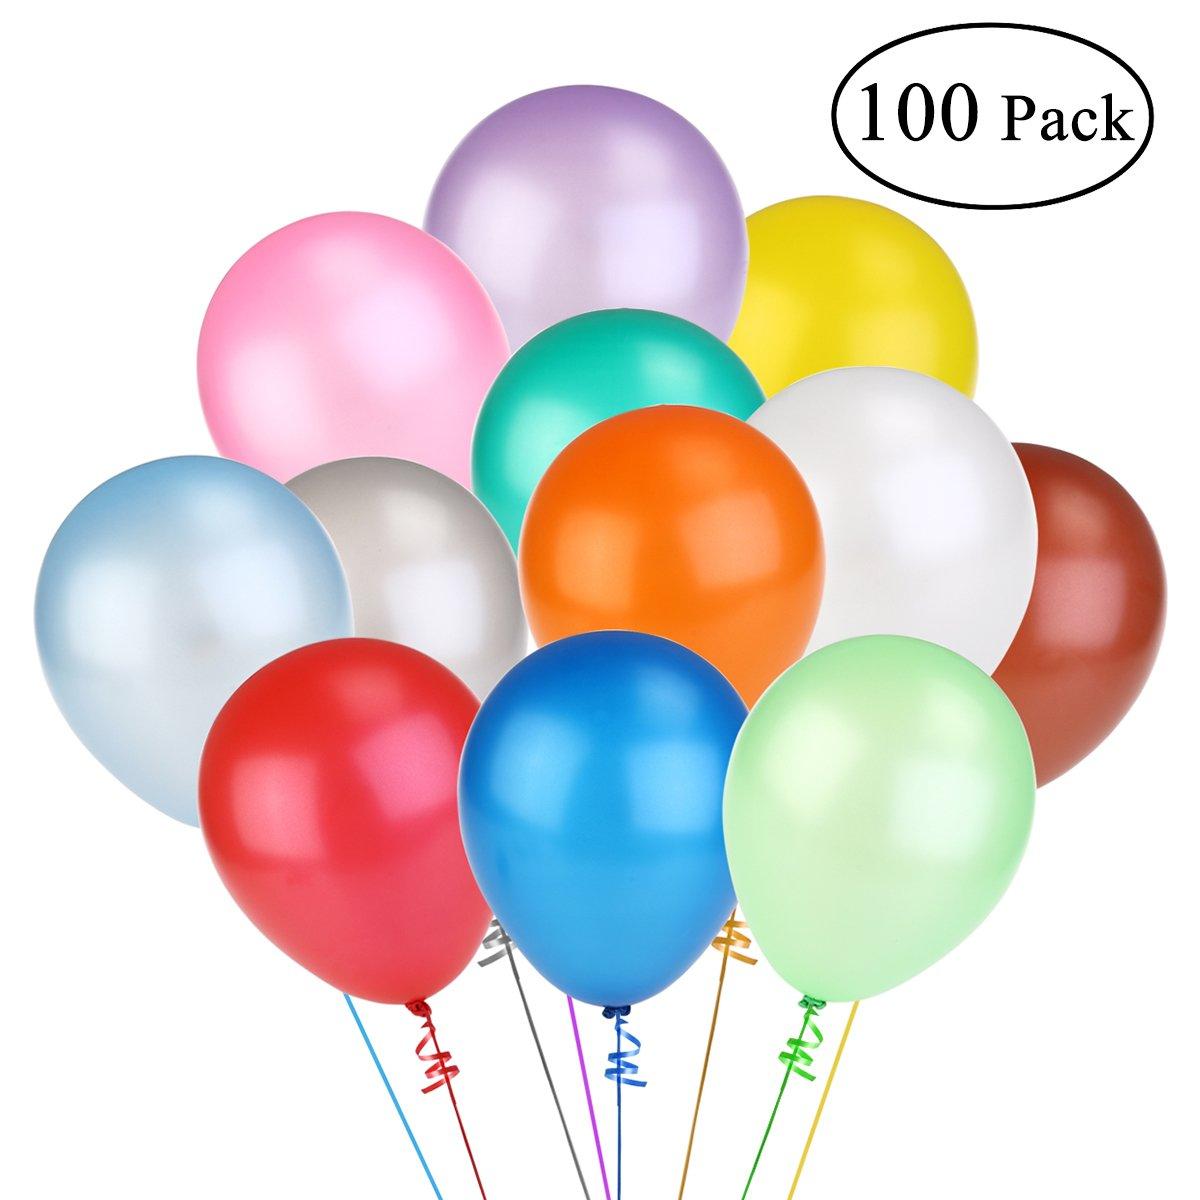 NUOLUX Assorted Bright Farbe Latex Balloons 12 Inch 100pcs(Random Farbe)